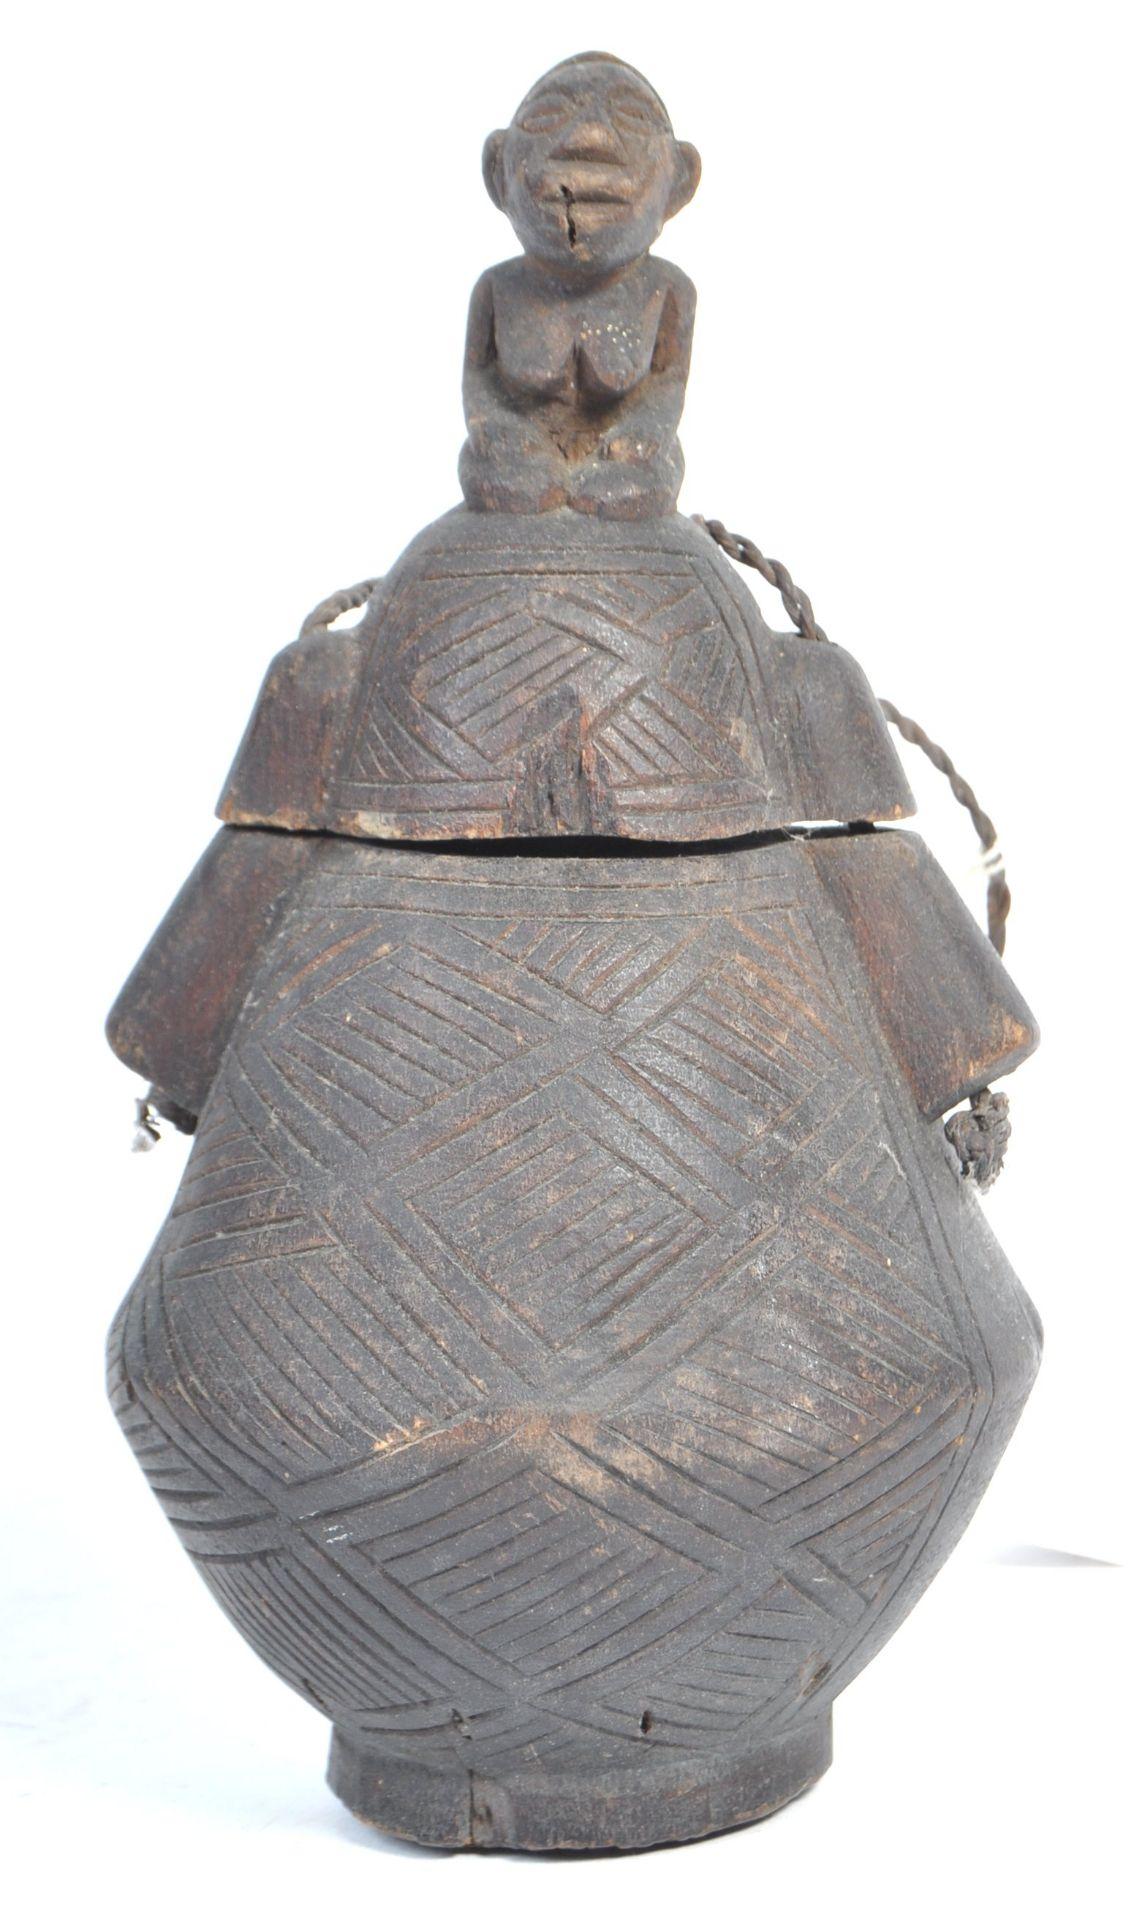 Los 541 - TRIBAL ANTIQUITIES - 19TH CENTURY AFRICAN ZAIRE KUBA POWDER FLASK